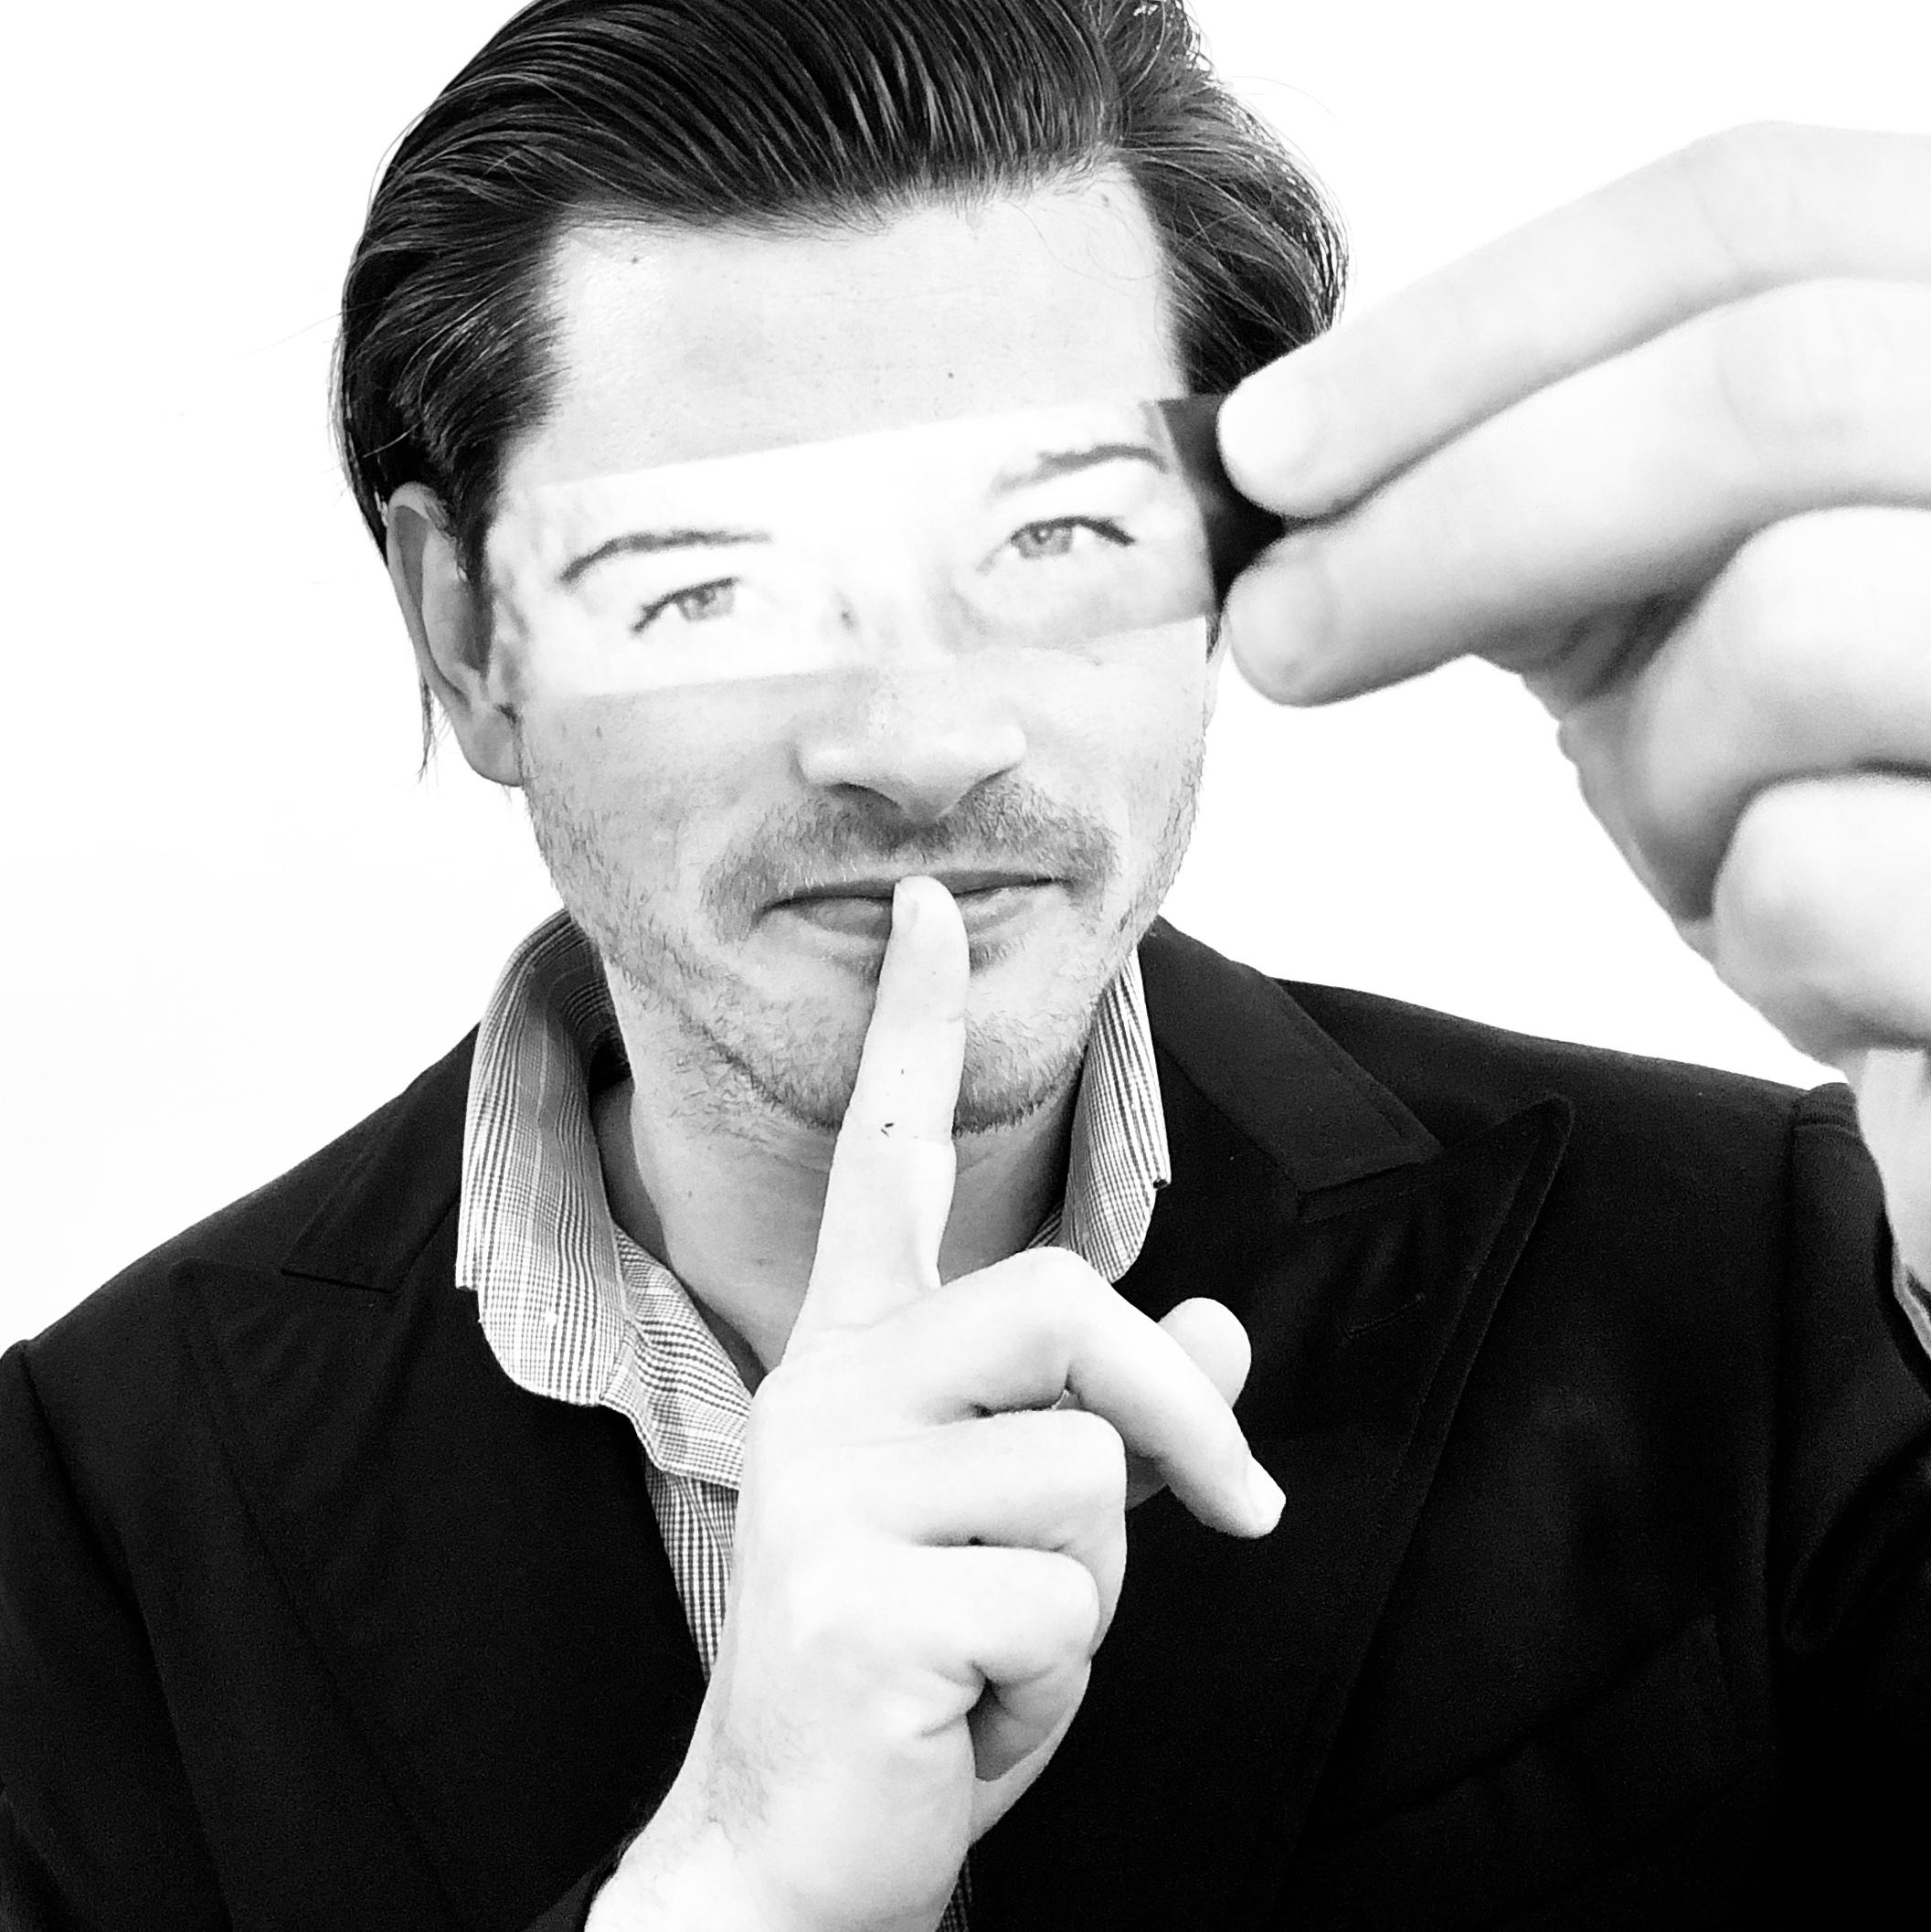 BORIS ALEXANDER BURGESS - Founder & Creative Director